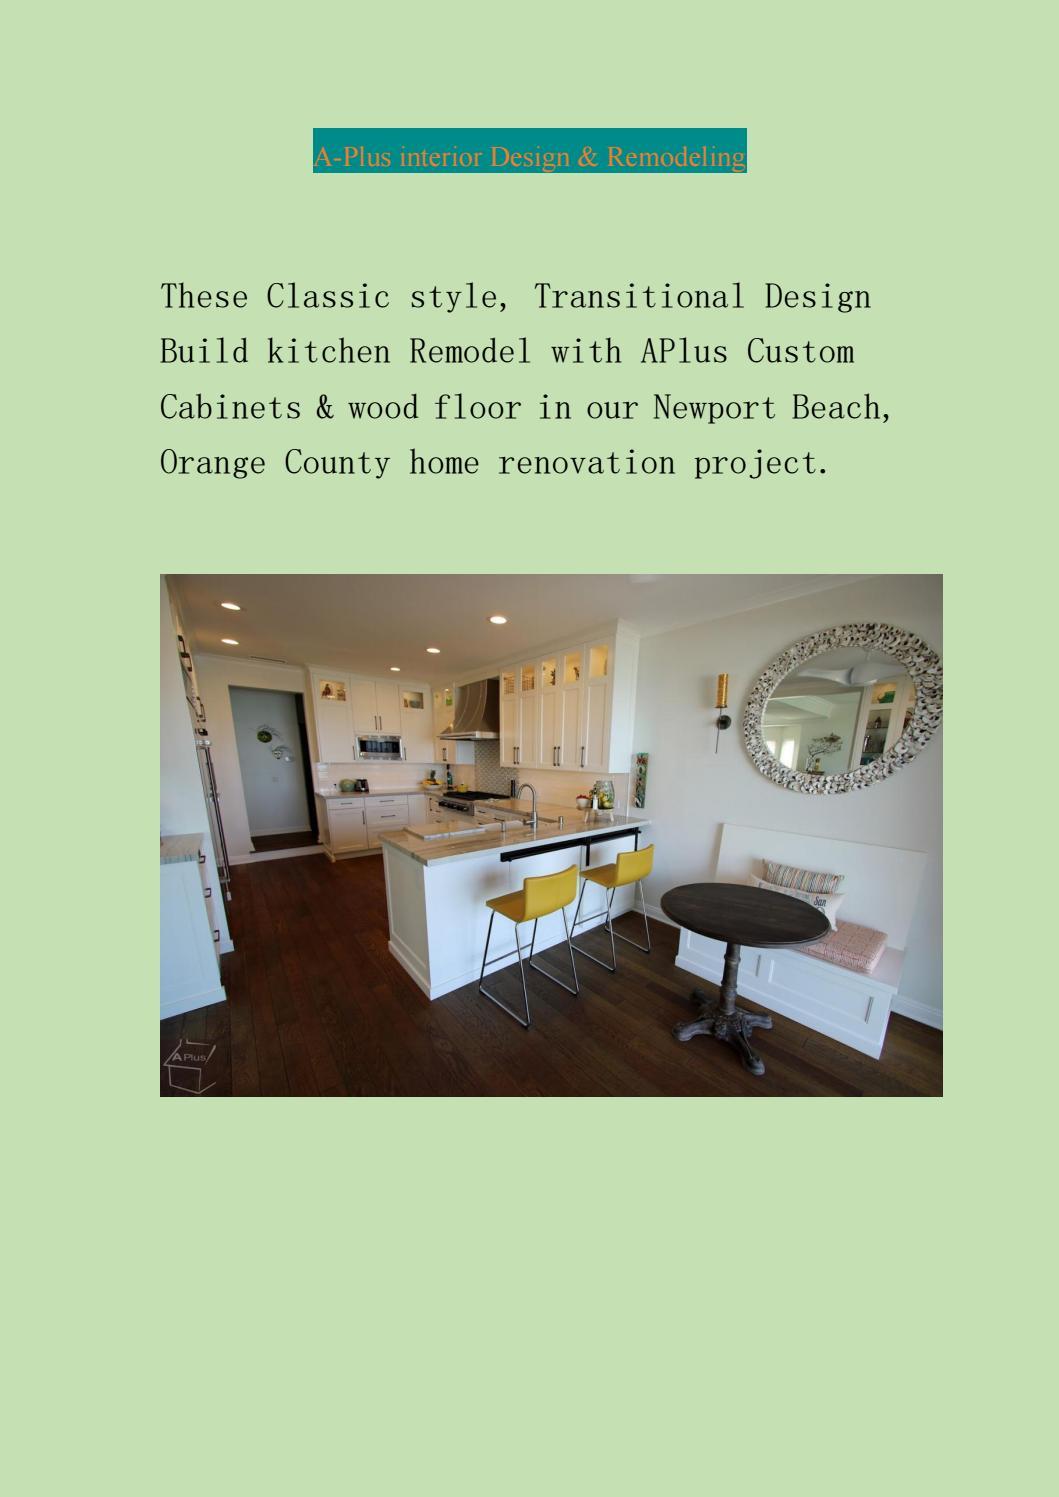 irvine kitchen remodeling by alex tabrizi - issuu